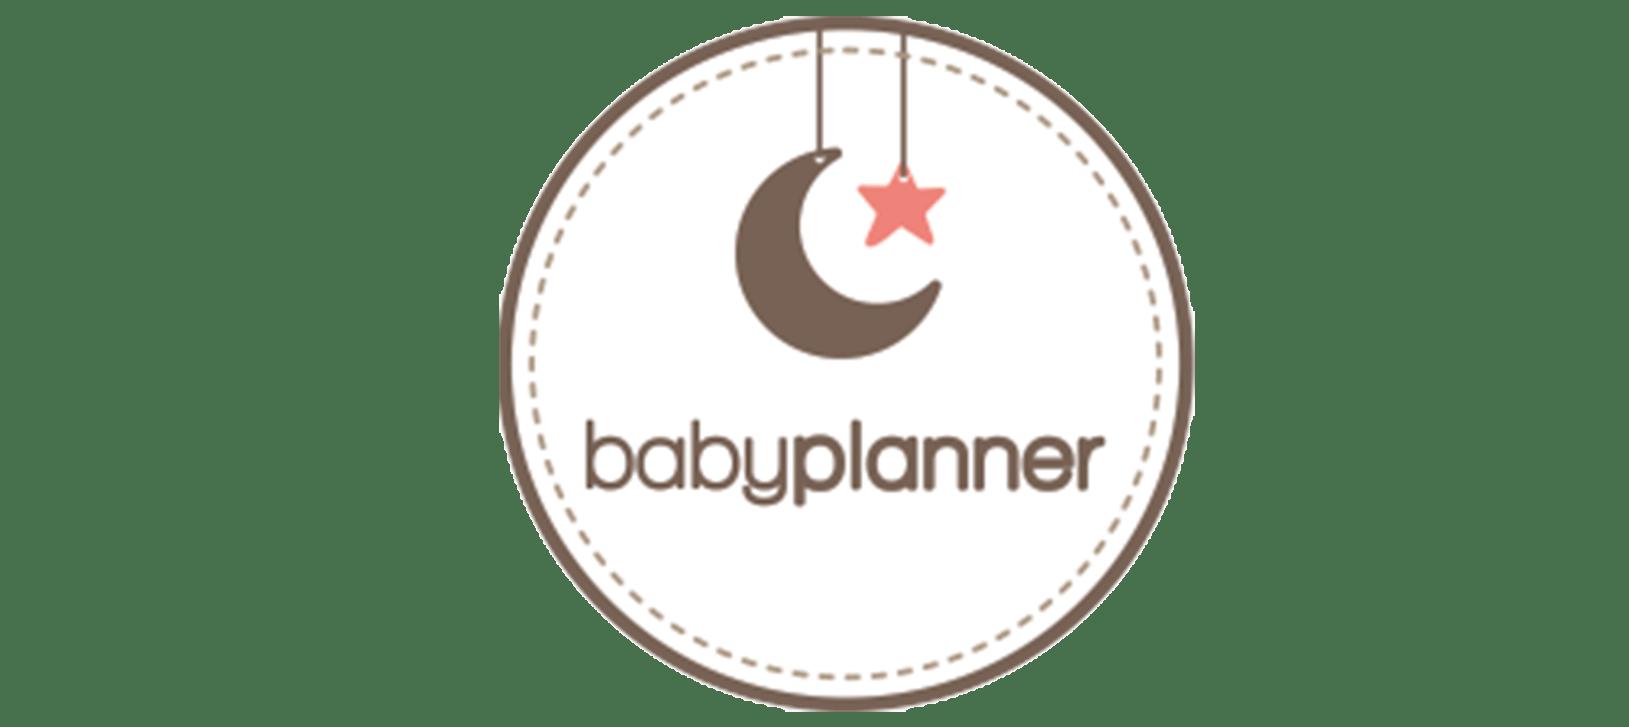 tubabyplanner